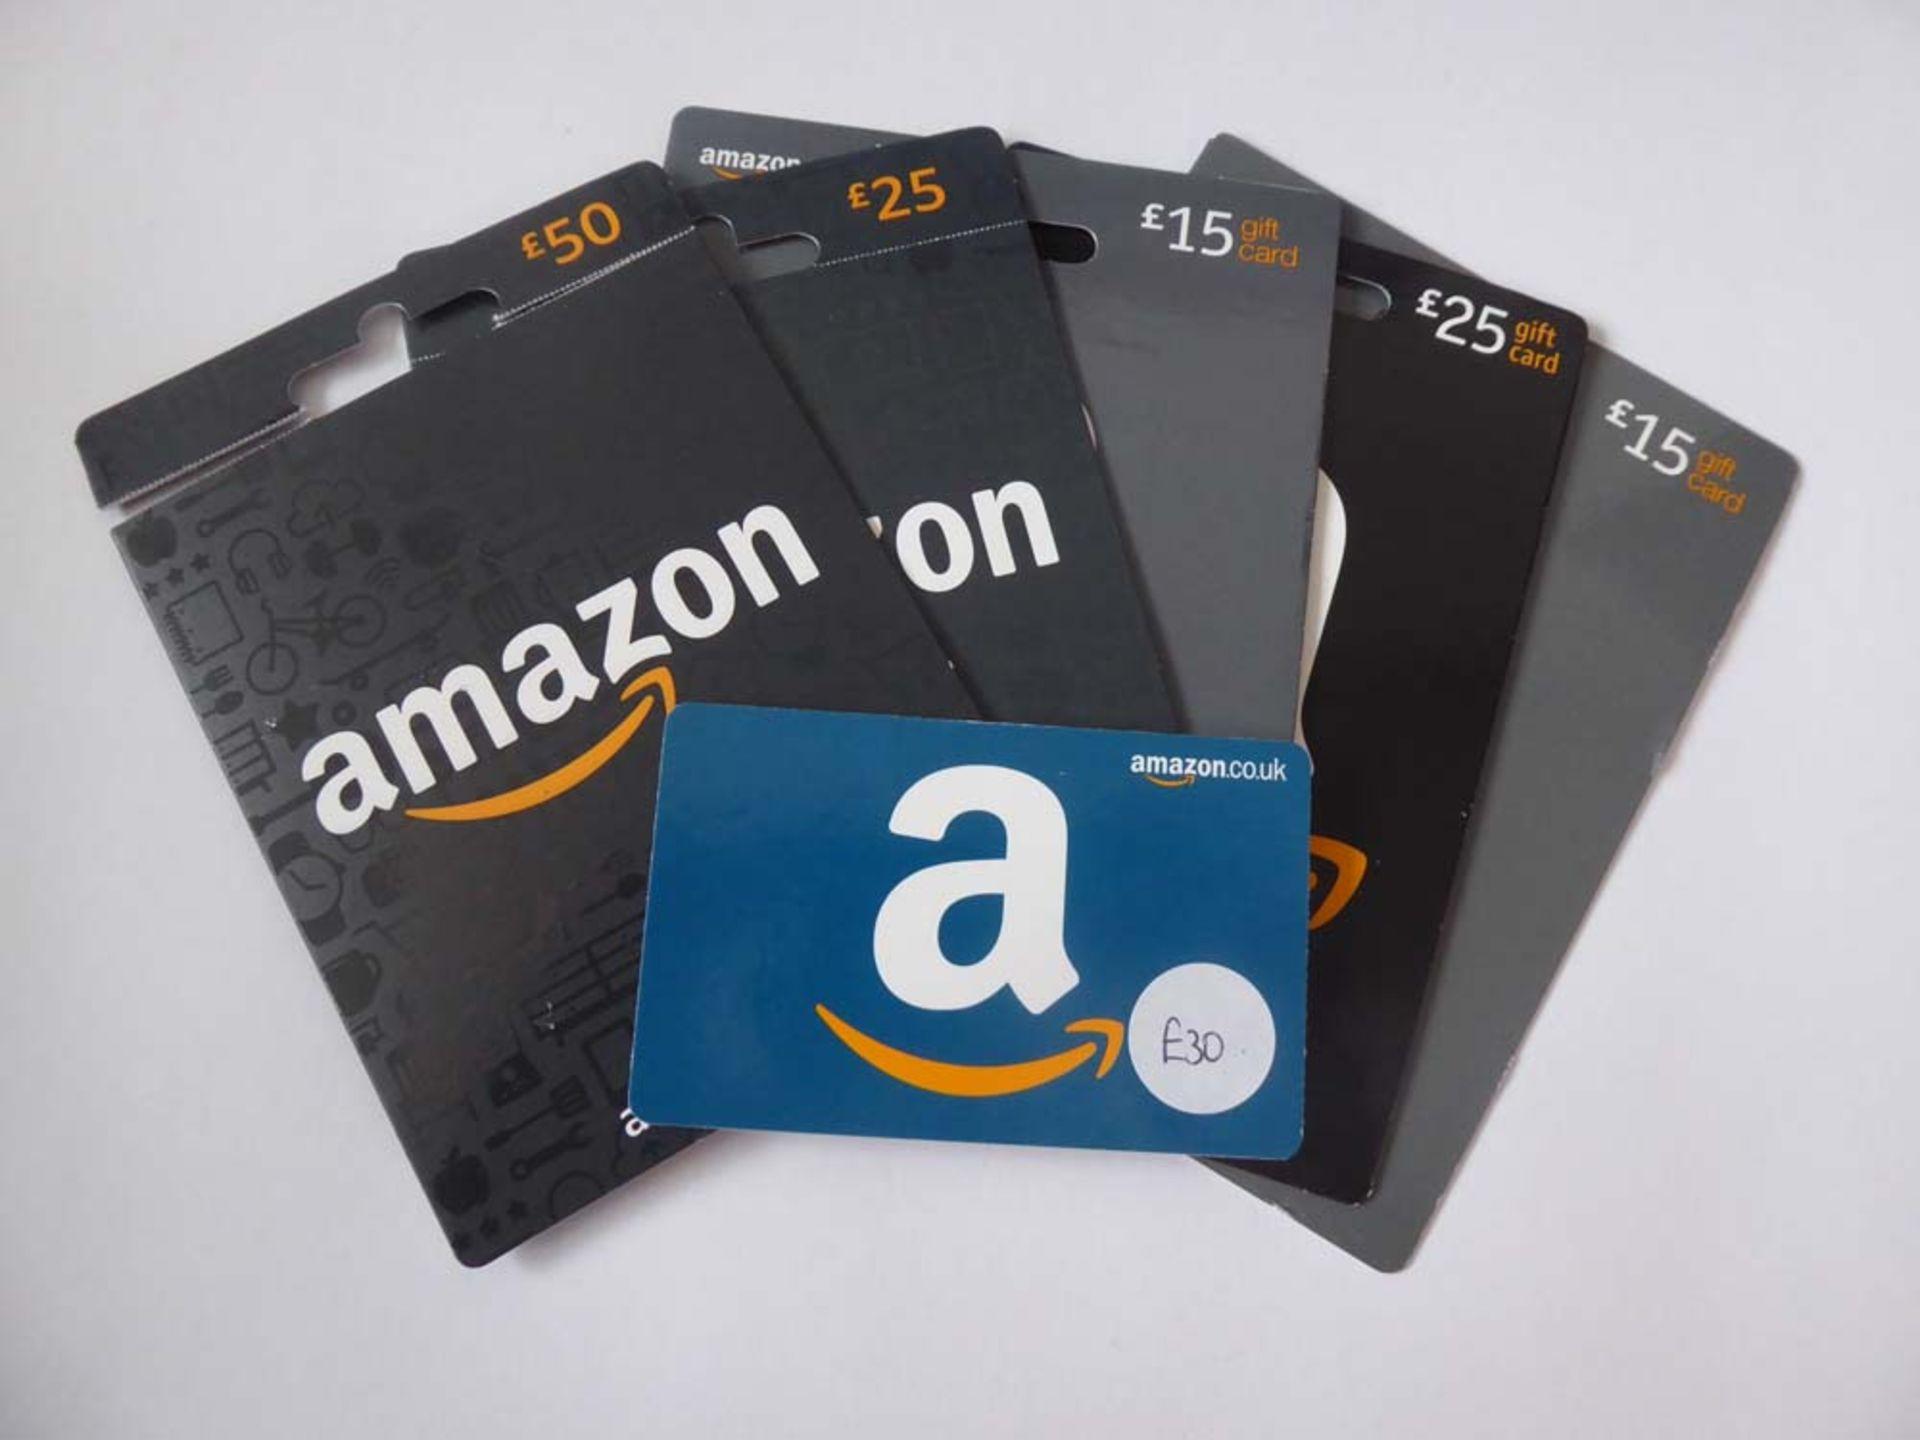 Amazon (x6) - Total face value £160